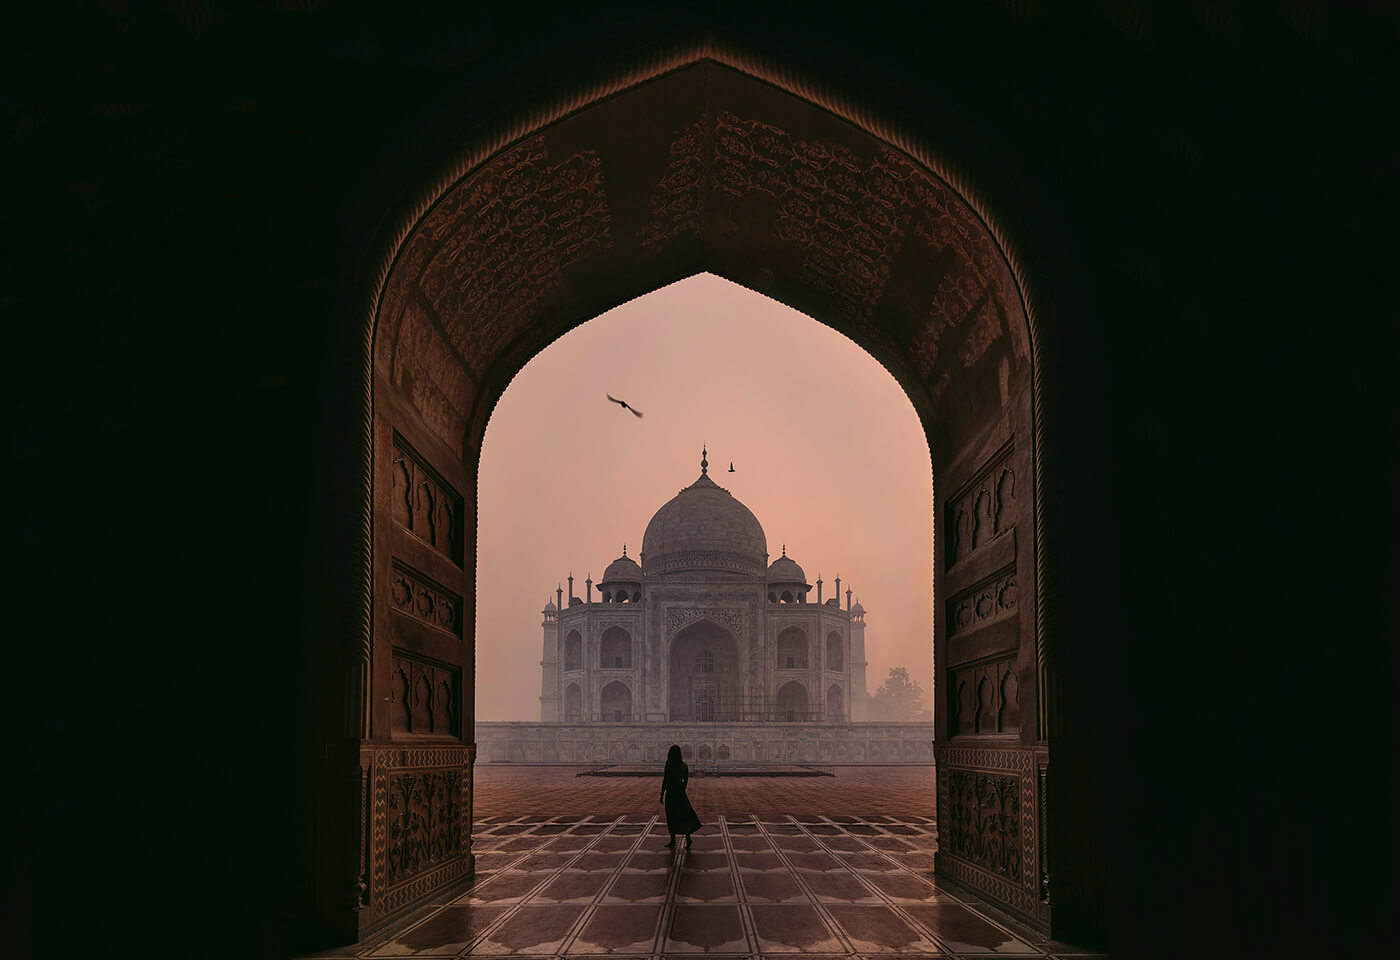 Landscape image of Taj Mahal